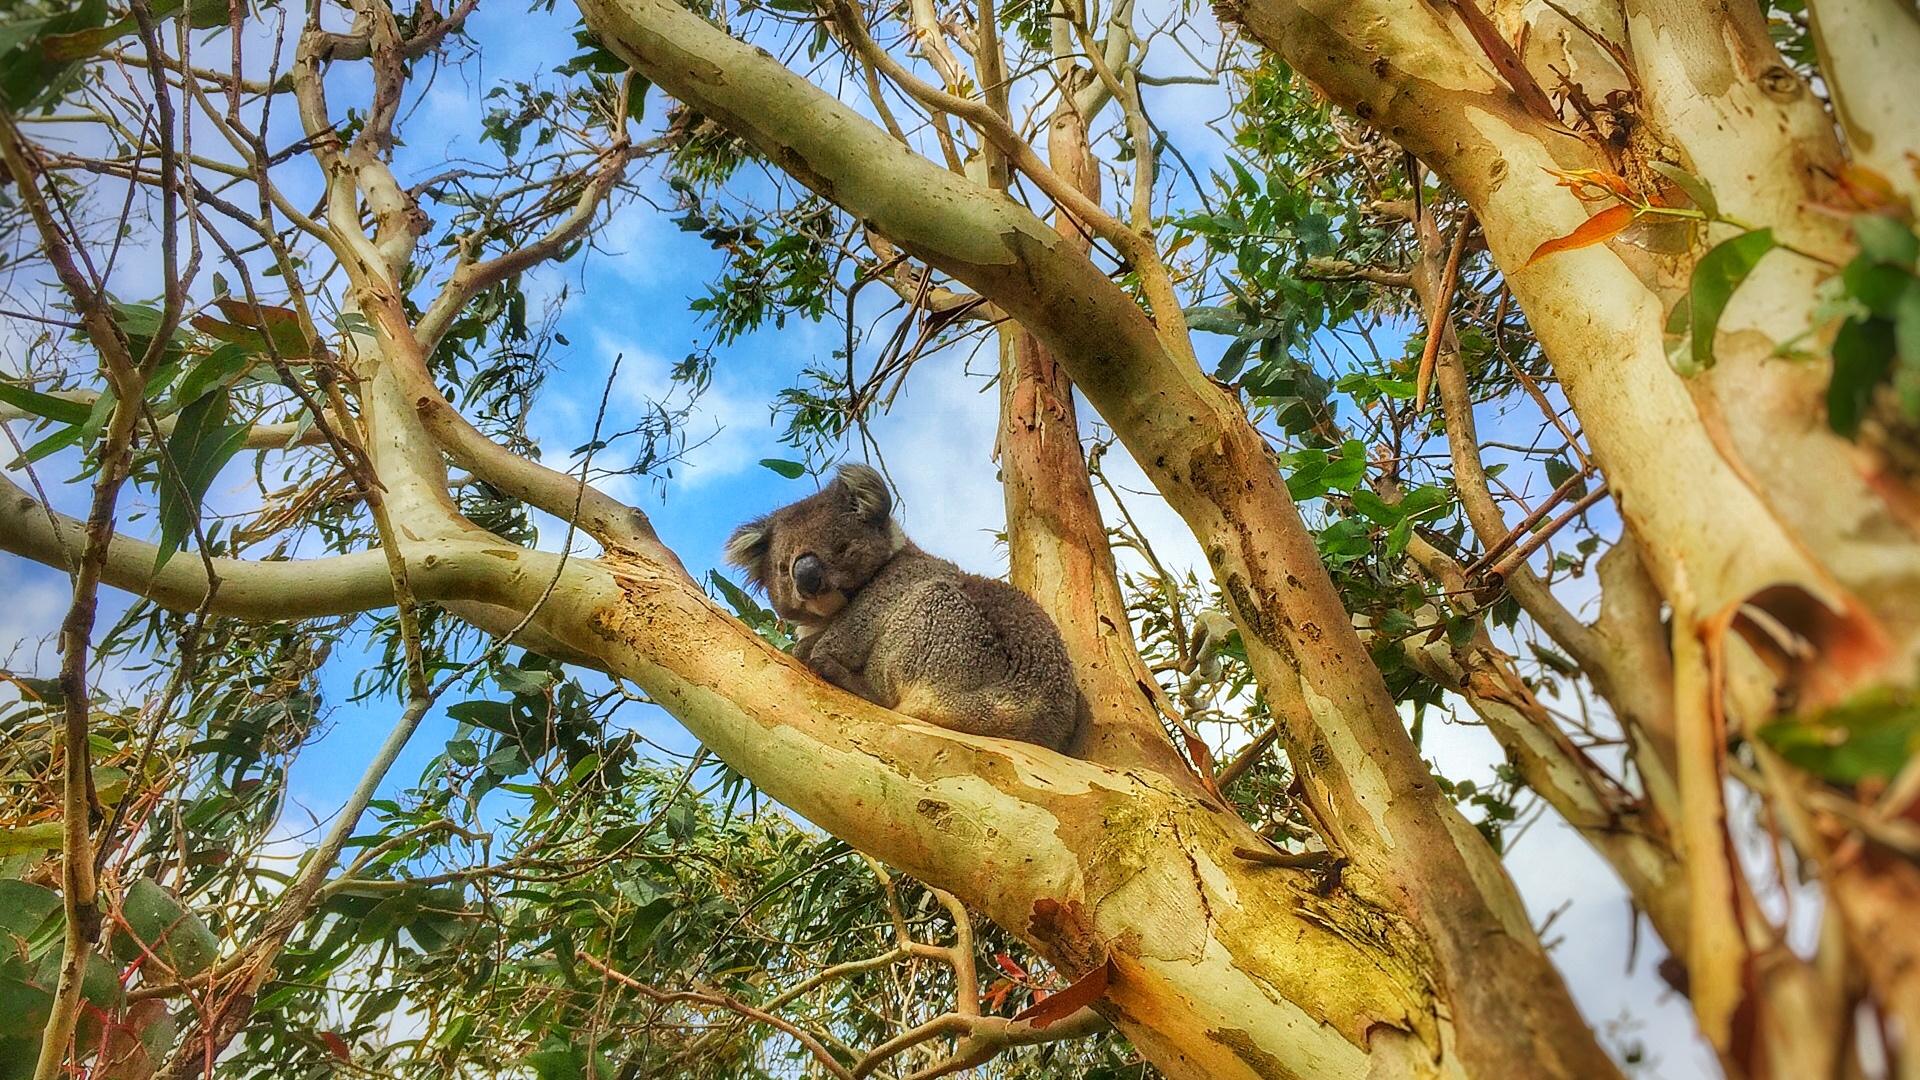 Studio Garden View of Koala